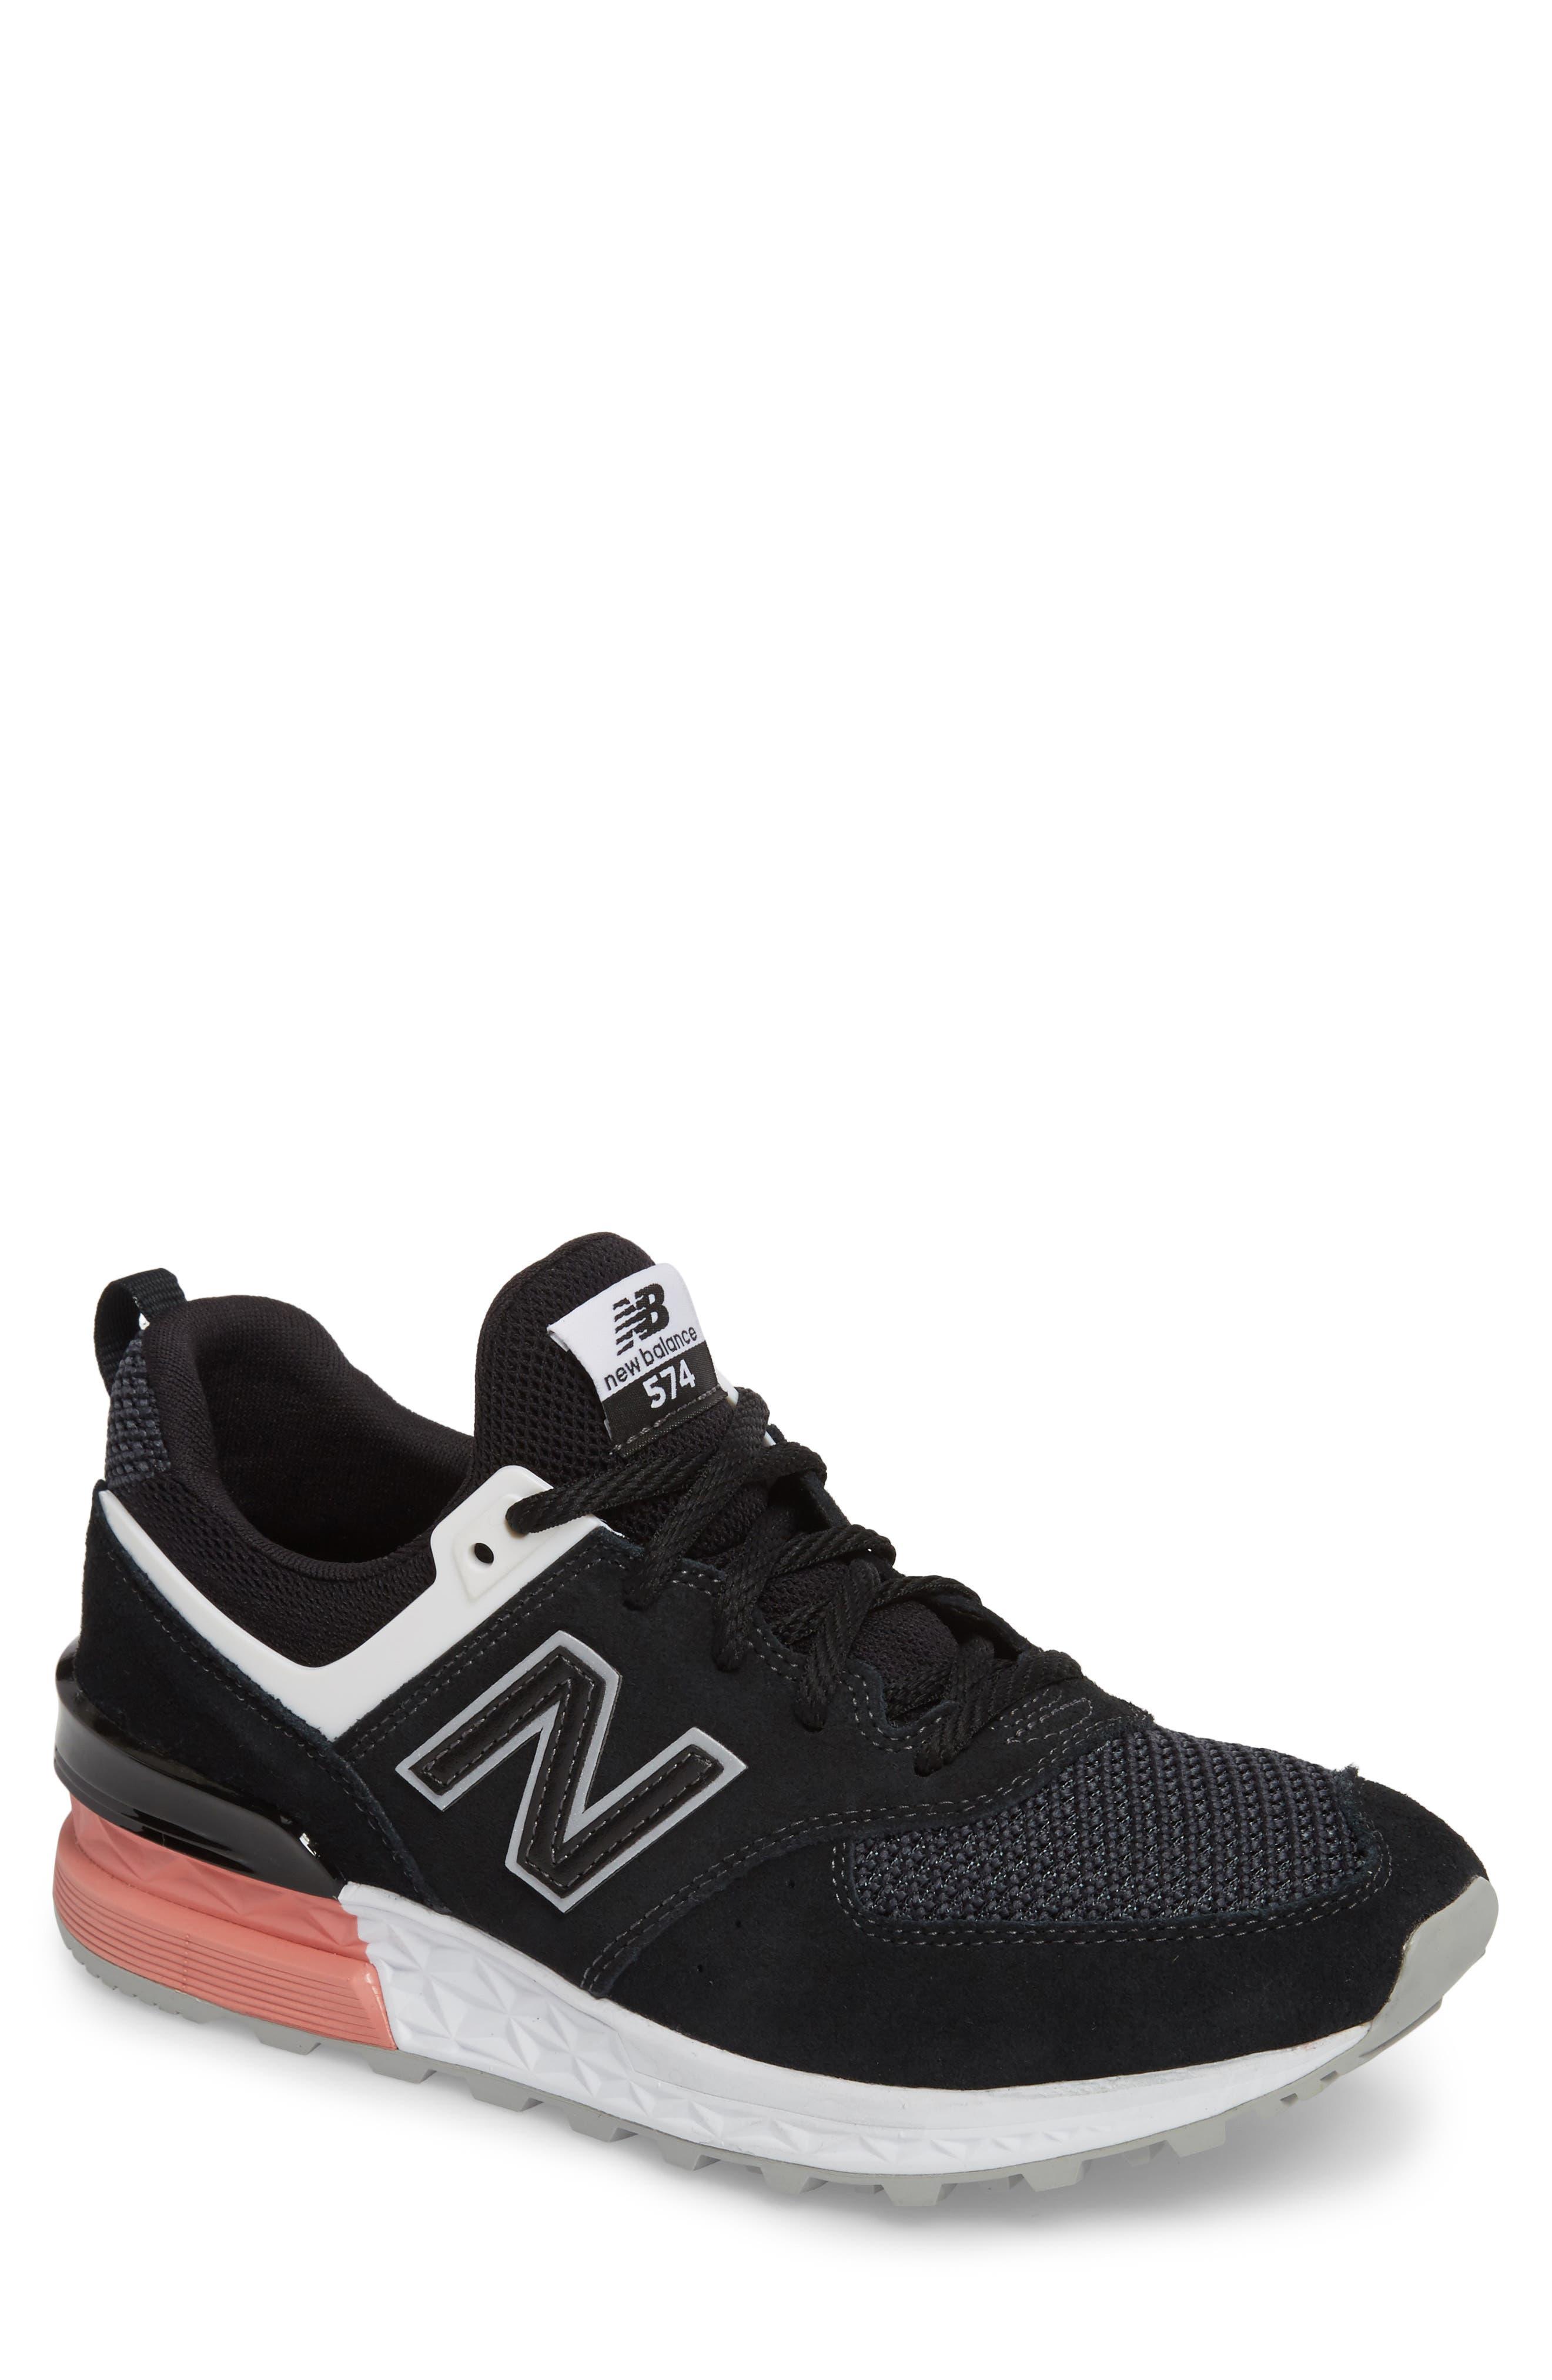 574 T3 Sport Sneaker,                         Main,                         color, Black